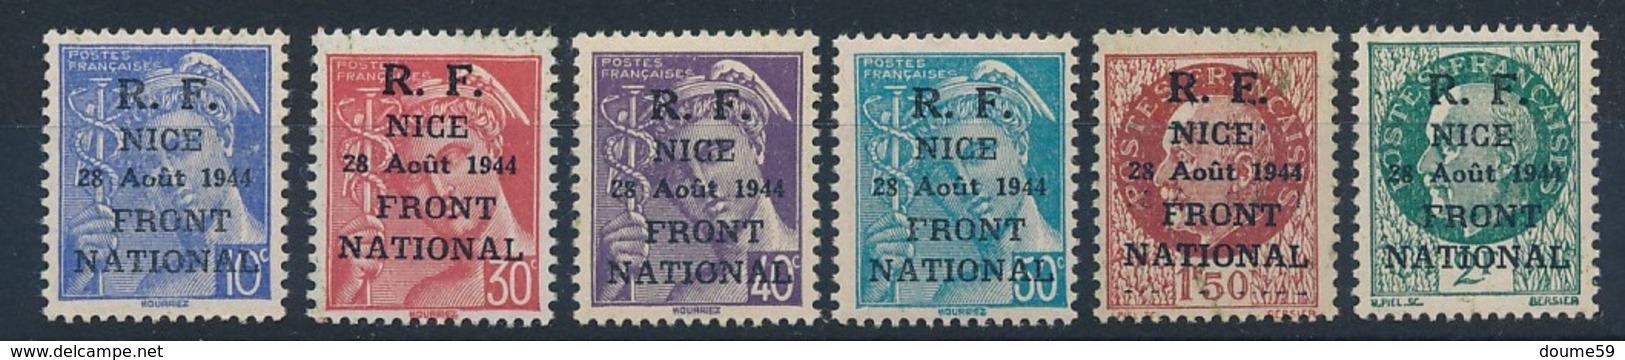 DI-305: FRANCE: Lot Avec Libération NICE N°1/6** - Libération